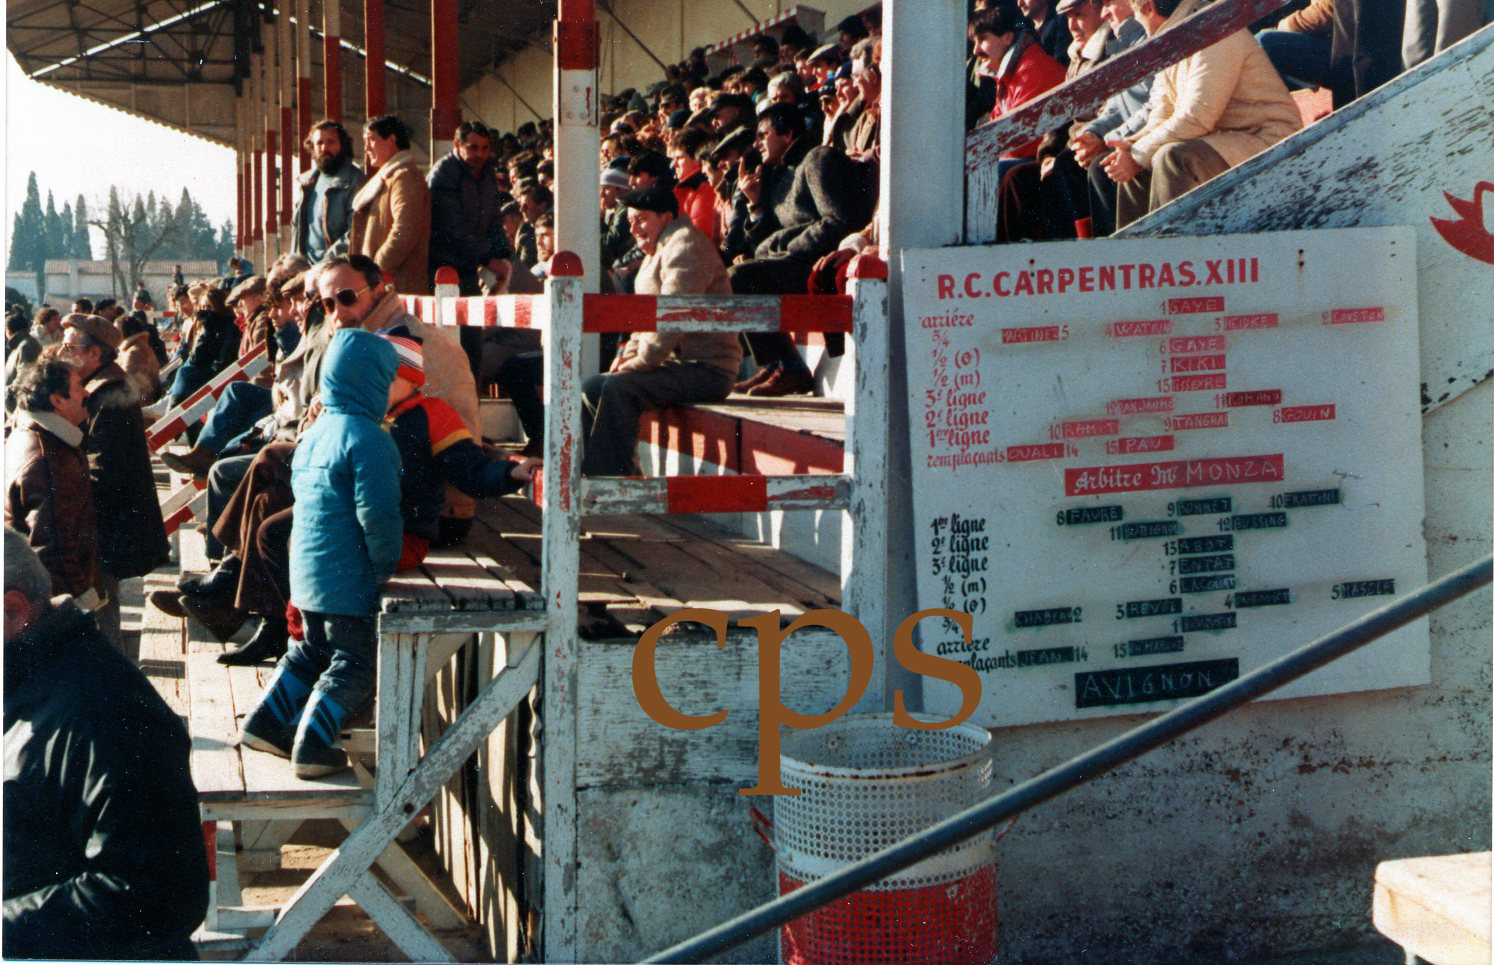 Tribunes du stade de la Roseraie